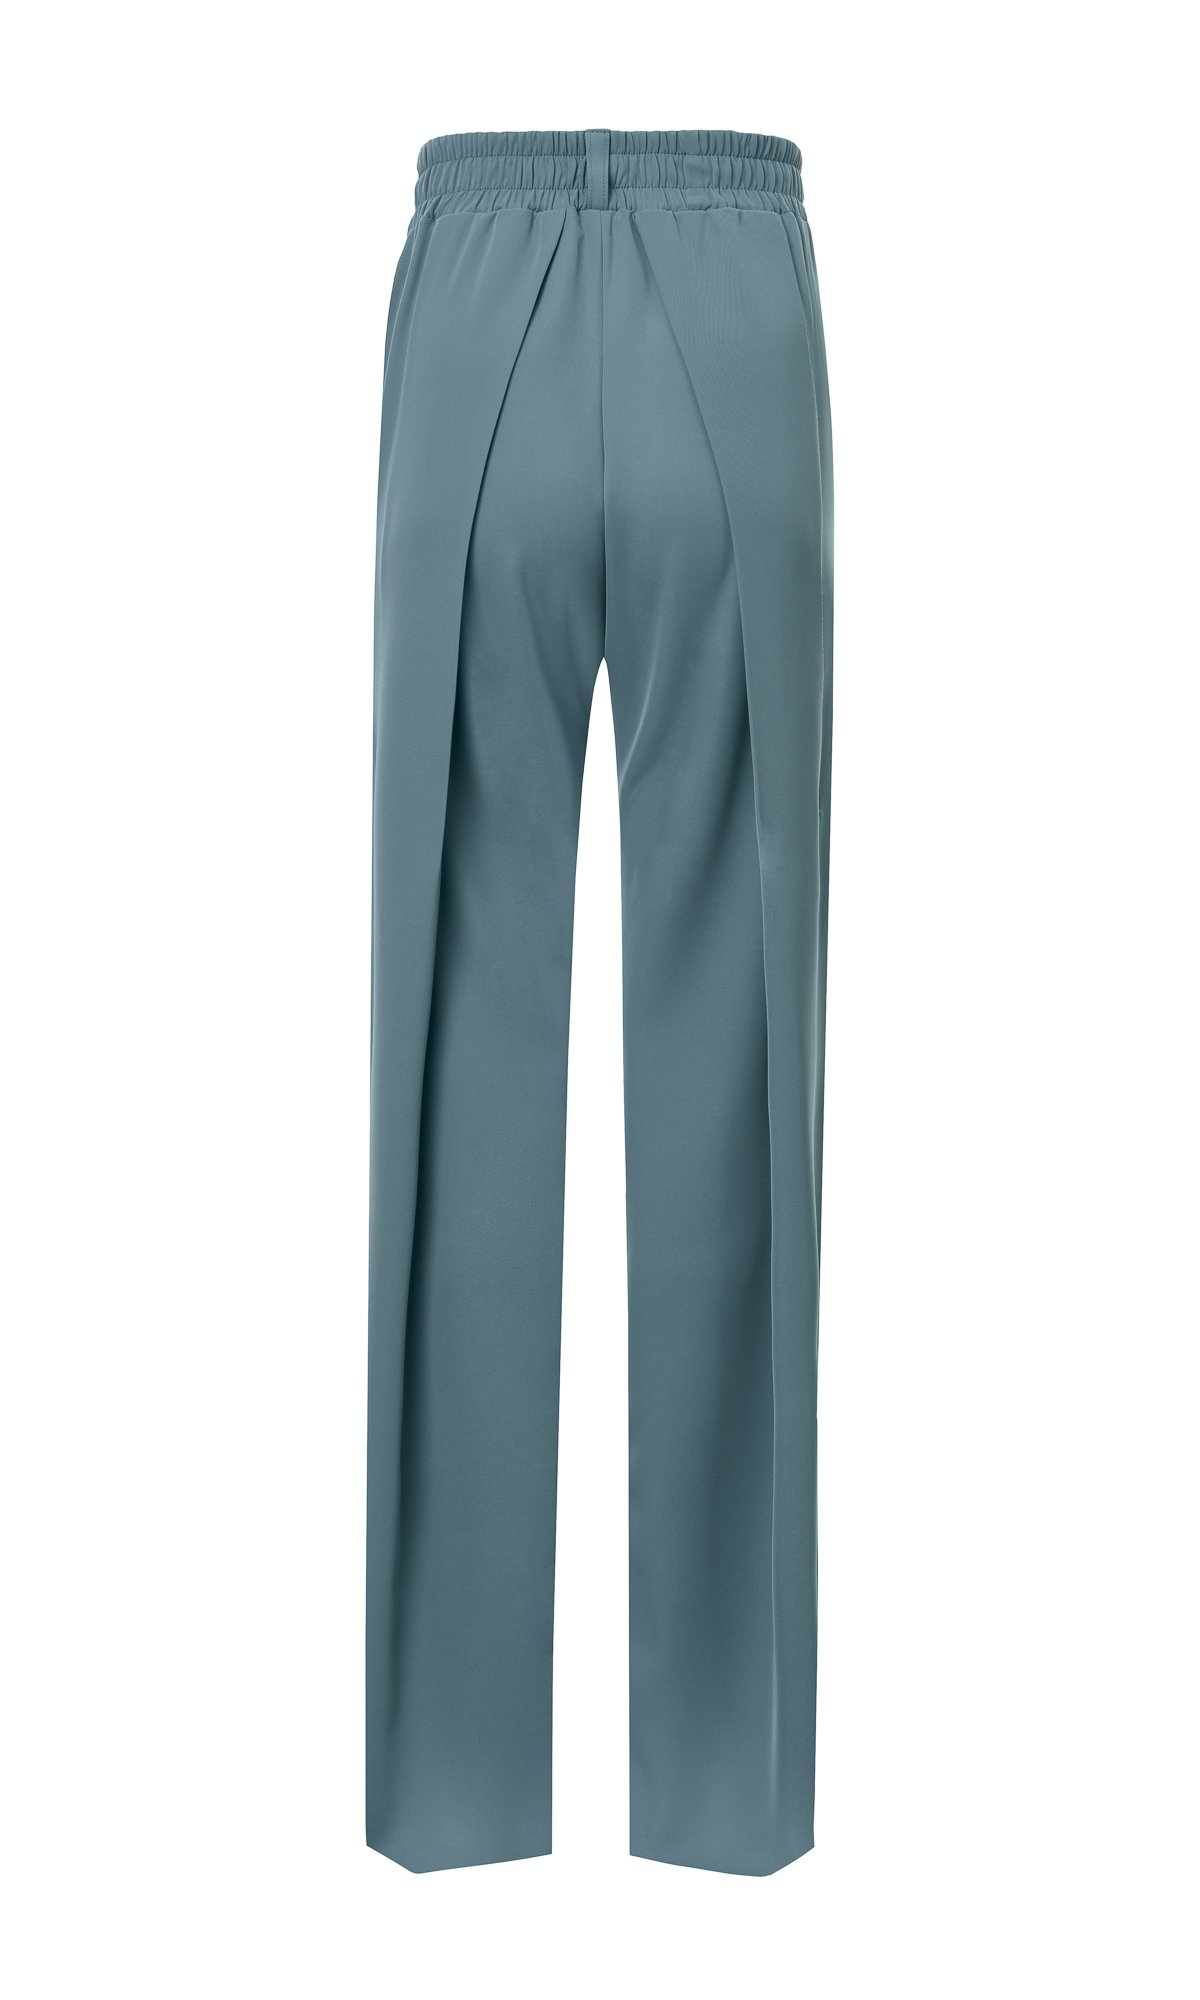 Straight Blazer & Wide Tuck Pants Suit